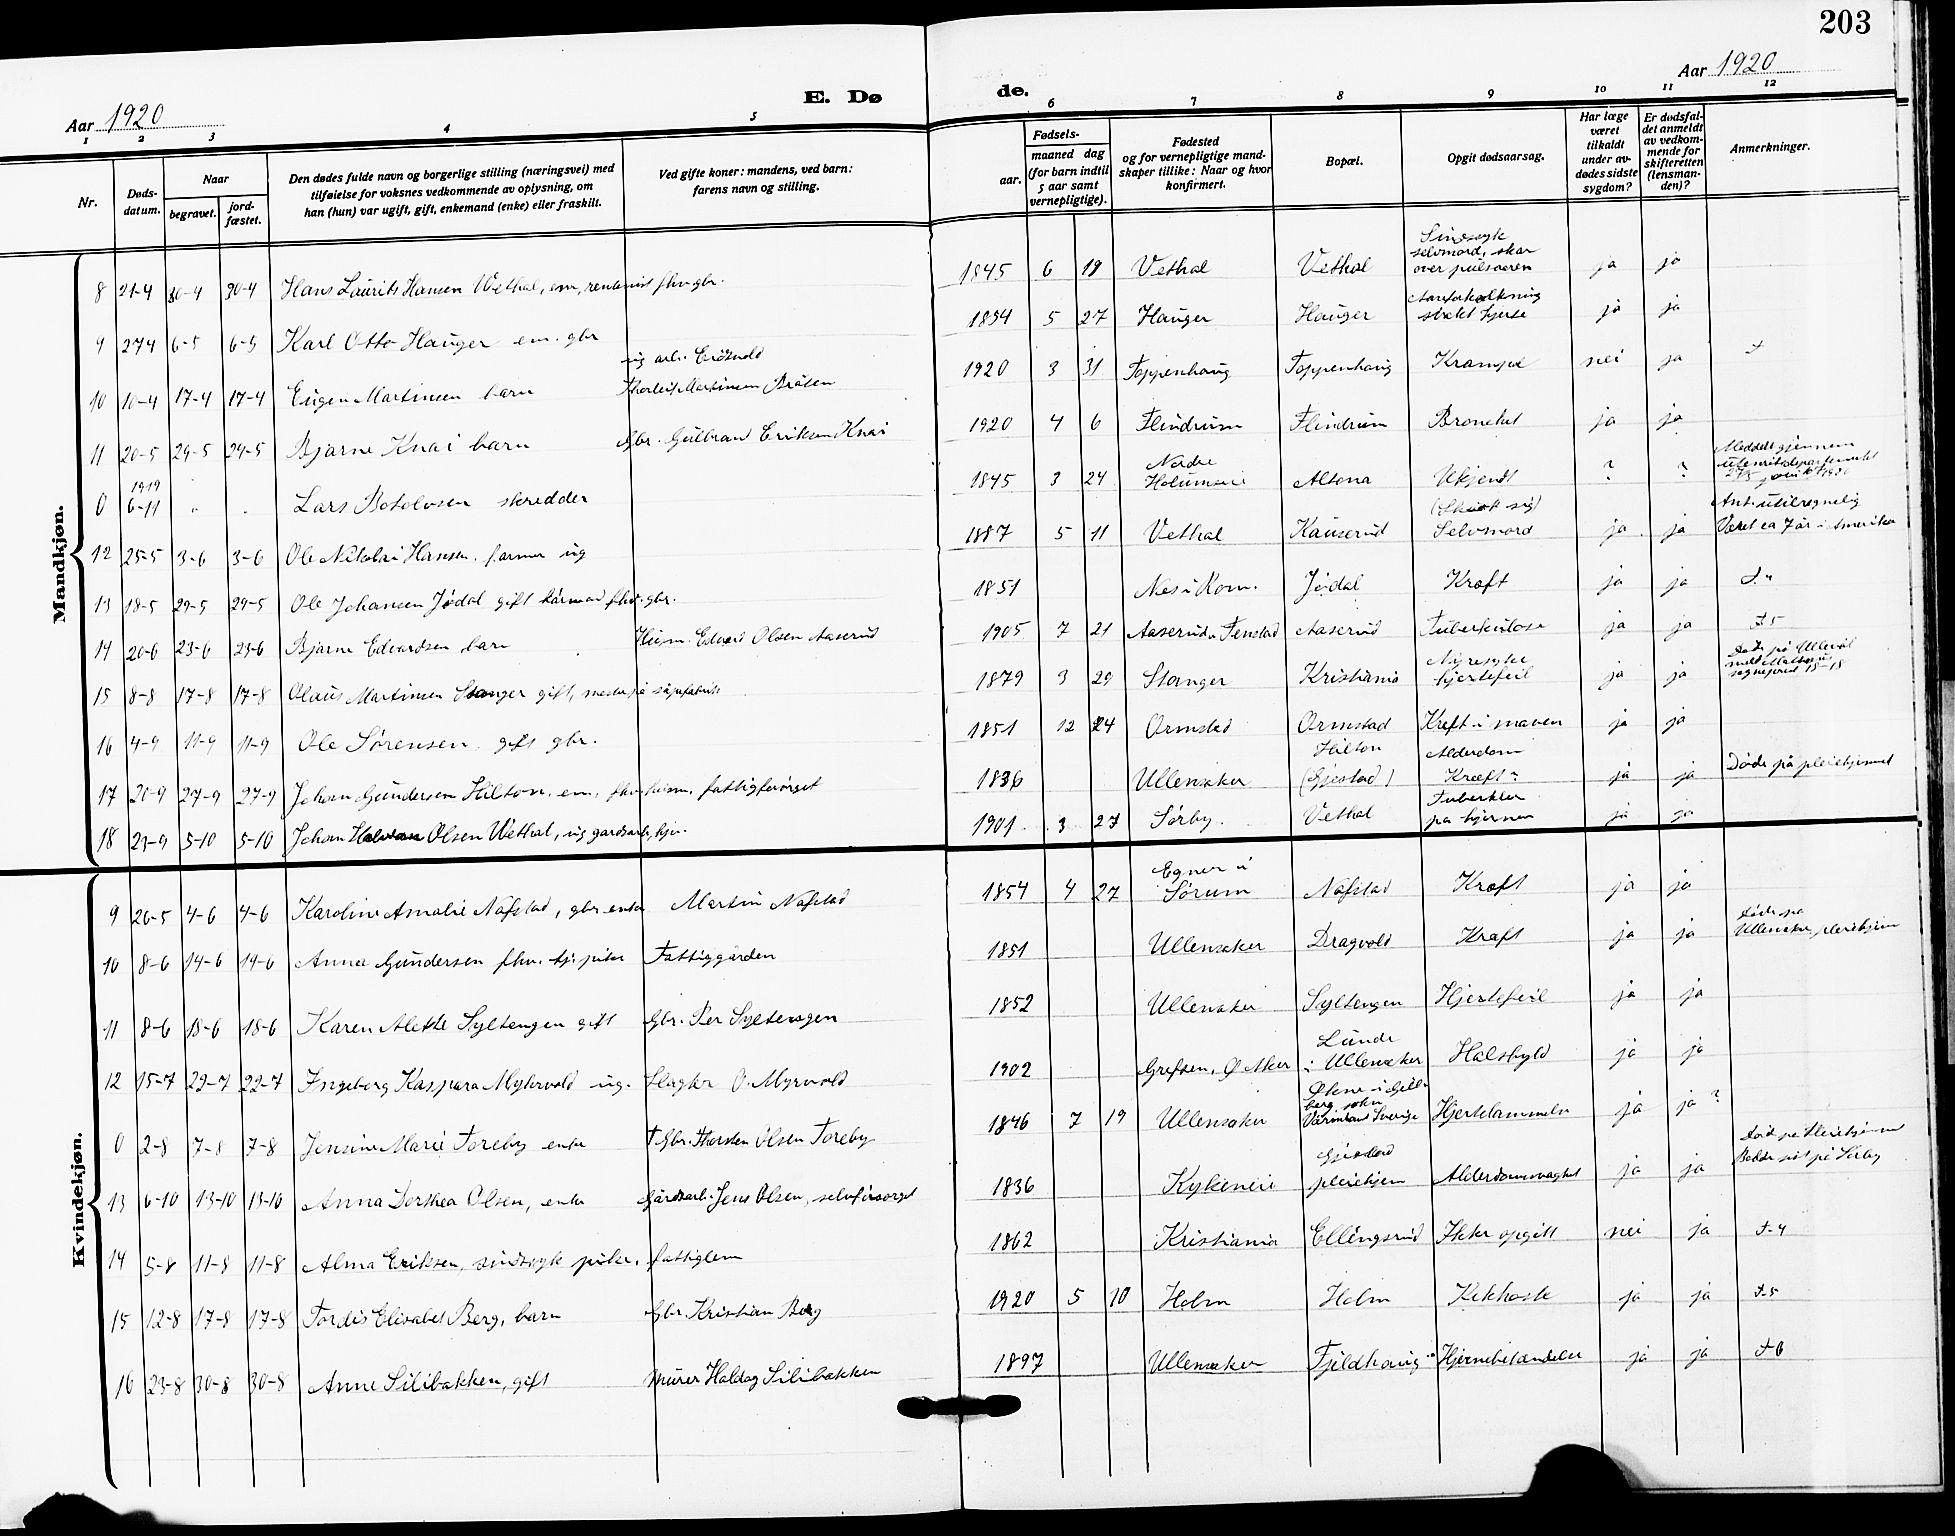 SAO, Ullensaker prestekontor Kirkebøker, G/Ga/L0003: Klokkerbok nr. I 3, 1914-1929, s. 203